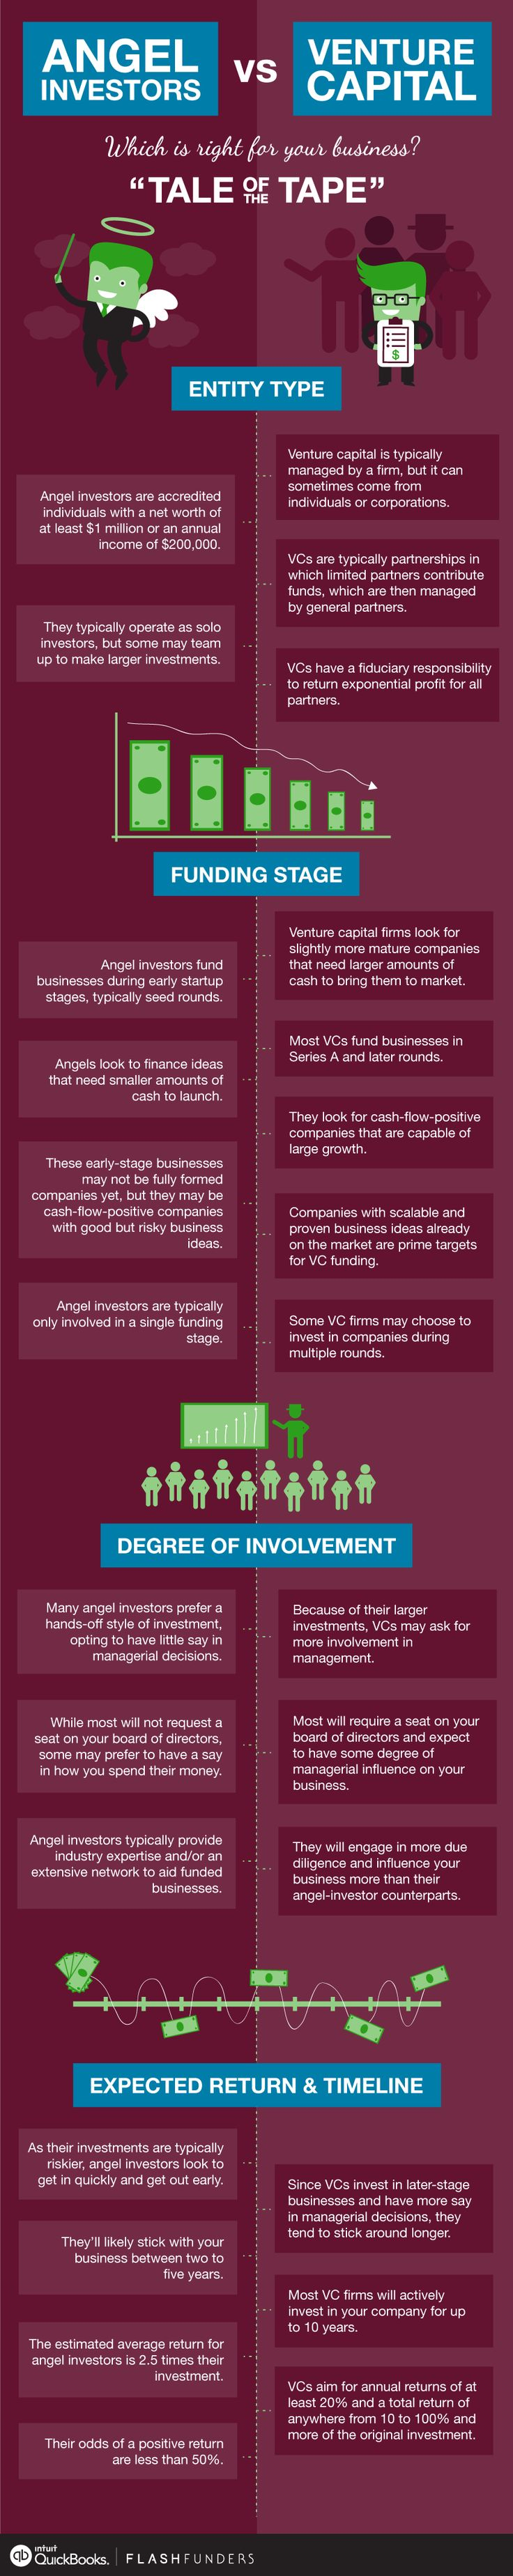 Angel_Investors_Vs_Venture_Capital-V3